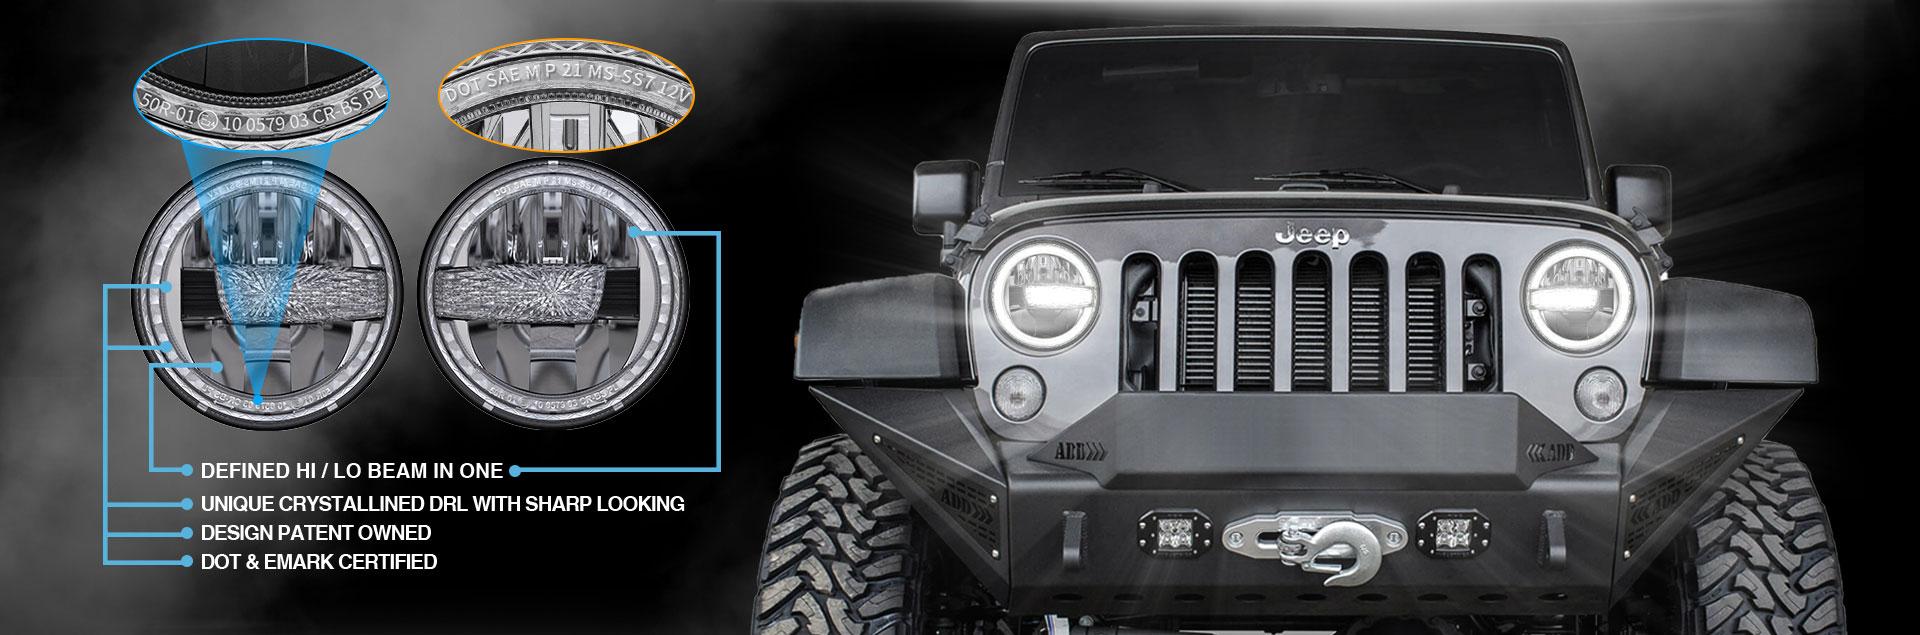 Bagong Arrival 2007-2017 Jeep Wrangler Nag-LED Headlight si JK